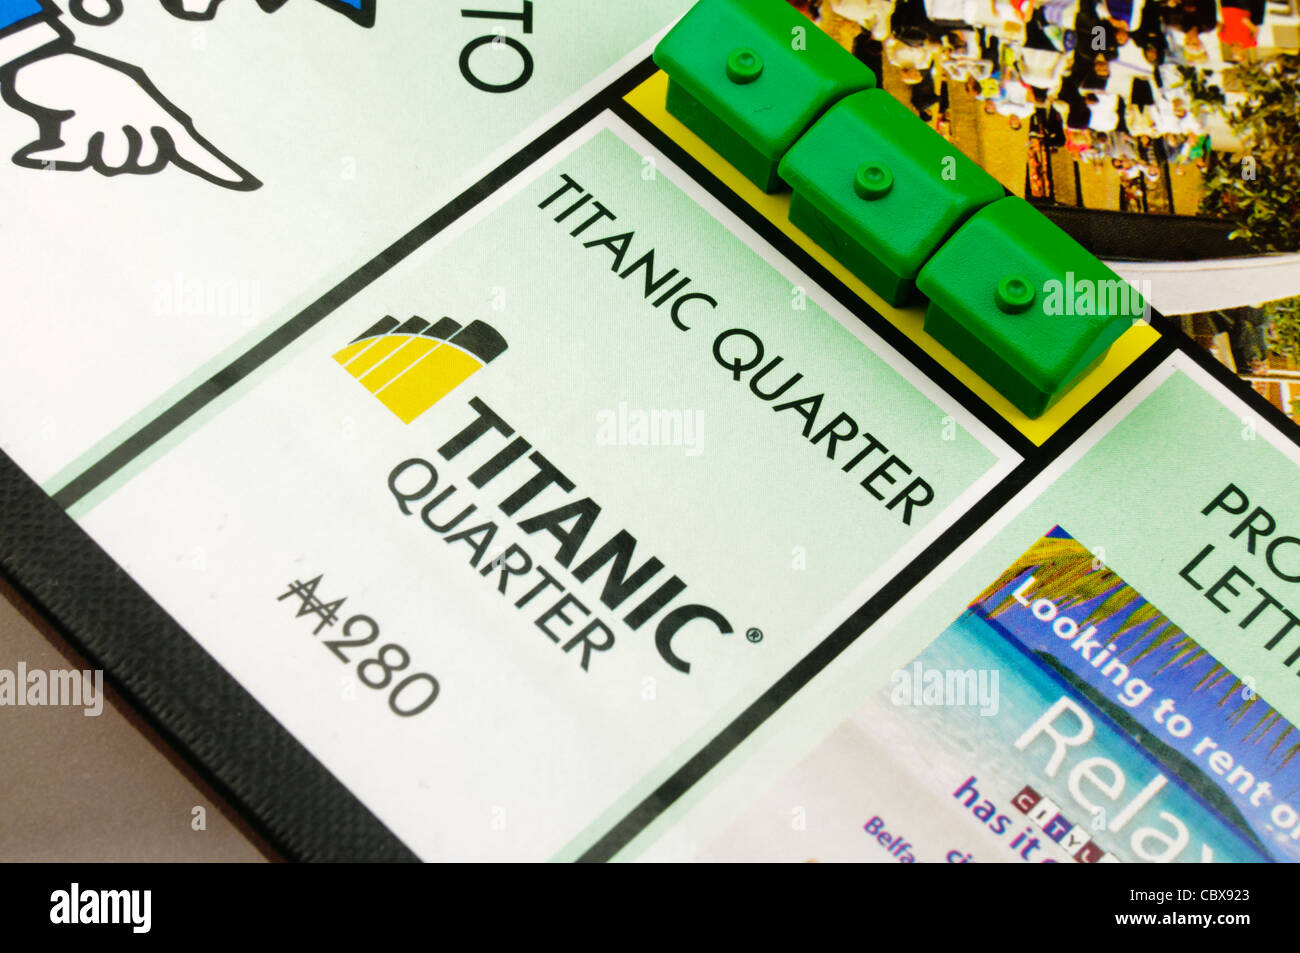 Belfast Monopoly: Building houses on Titanic Quarter - Stock Image